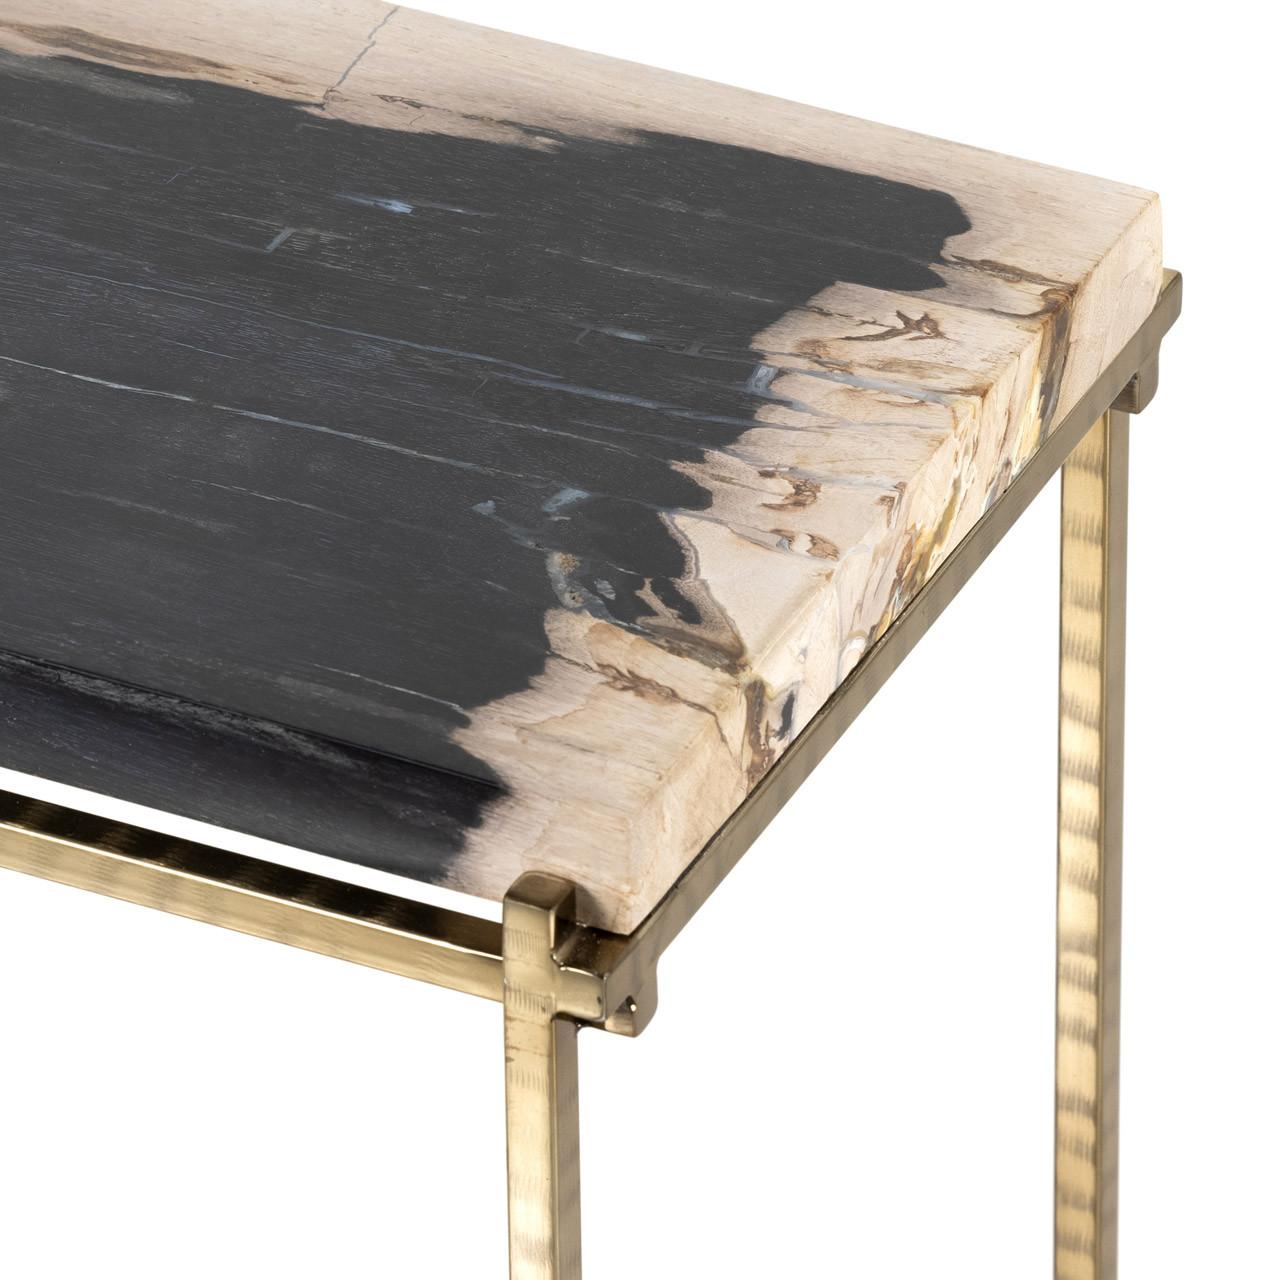 Tie End Table - Dark Petrified Wood